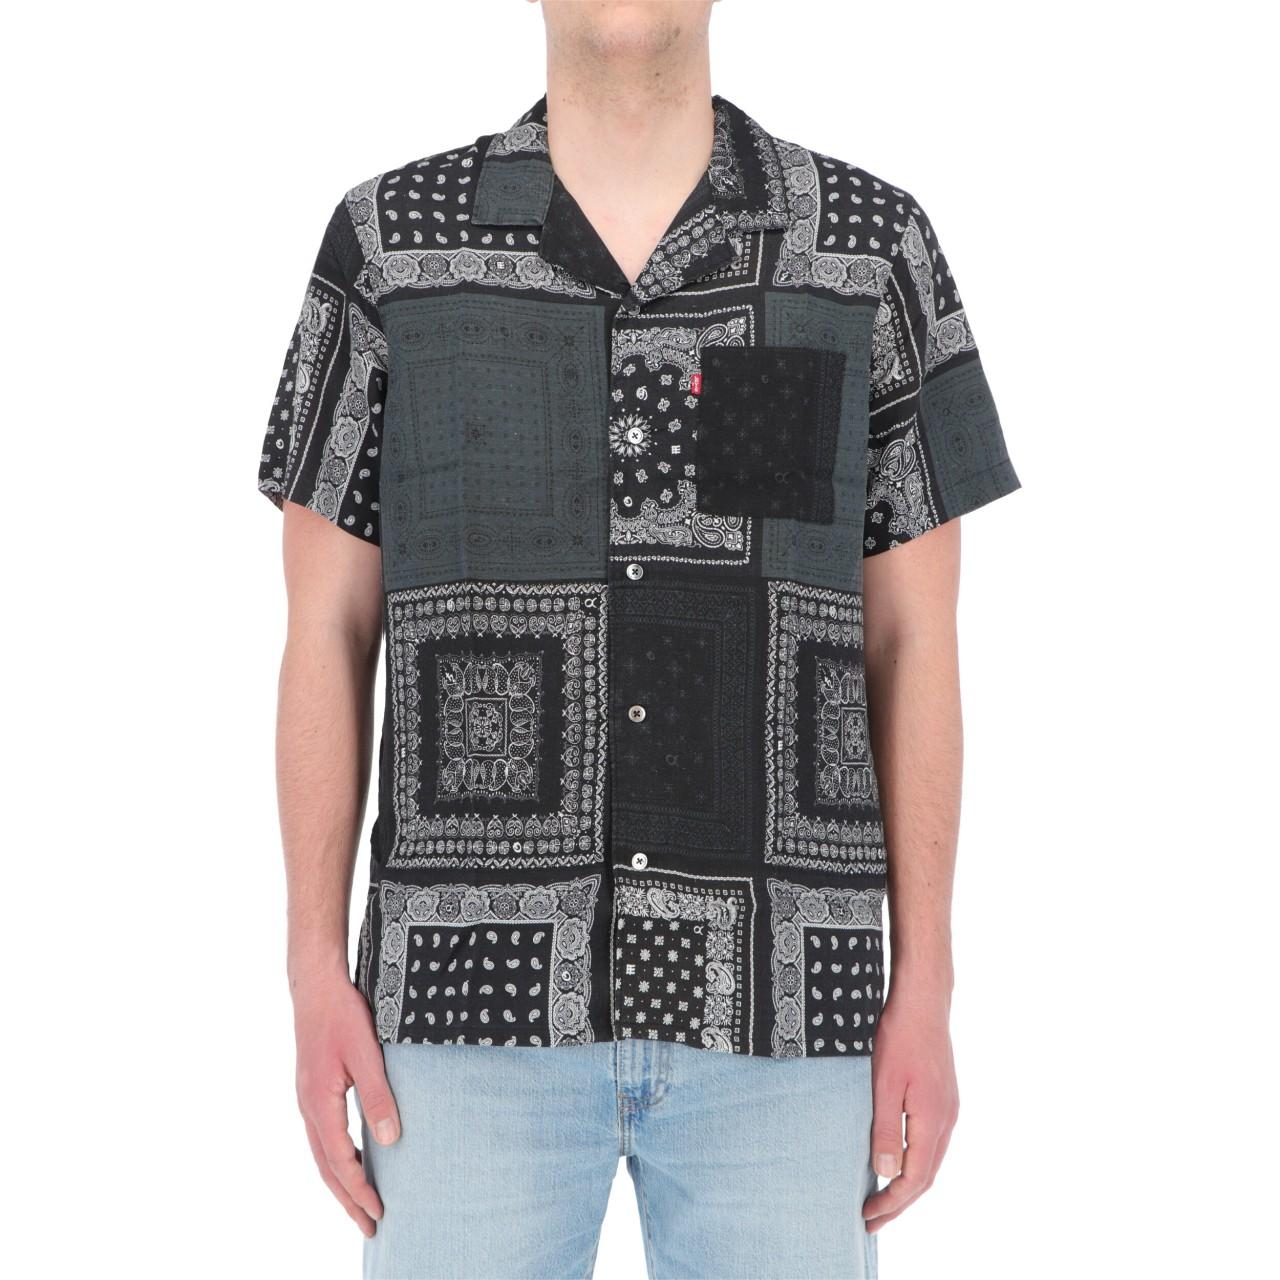 Levi's Uomo Camicia Levi's Uomo Cubano Shirt Multibandana 72625P